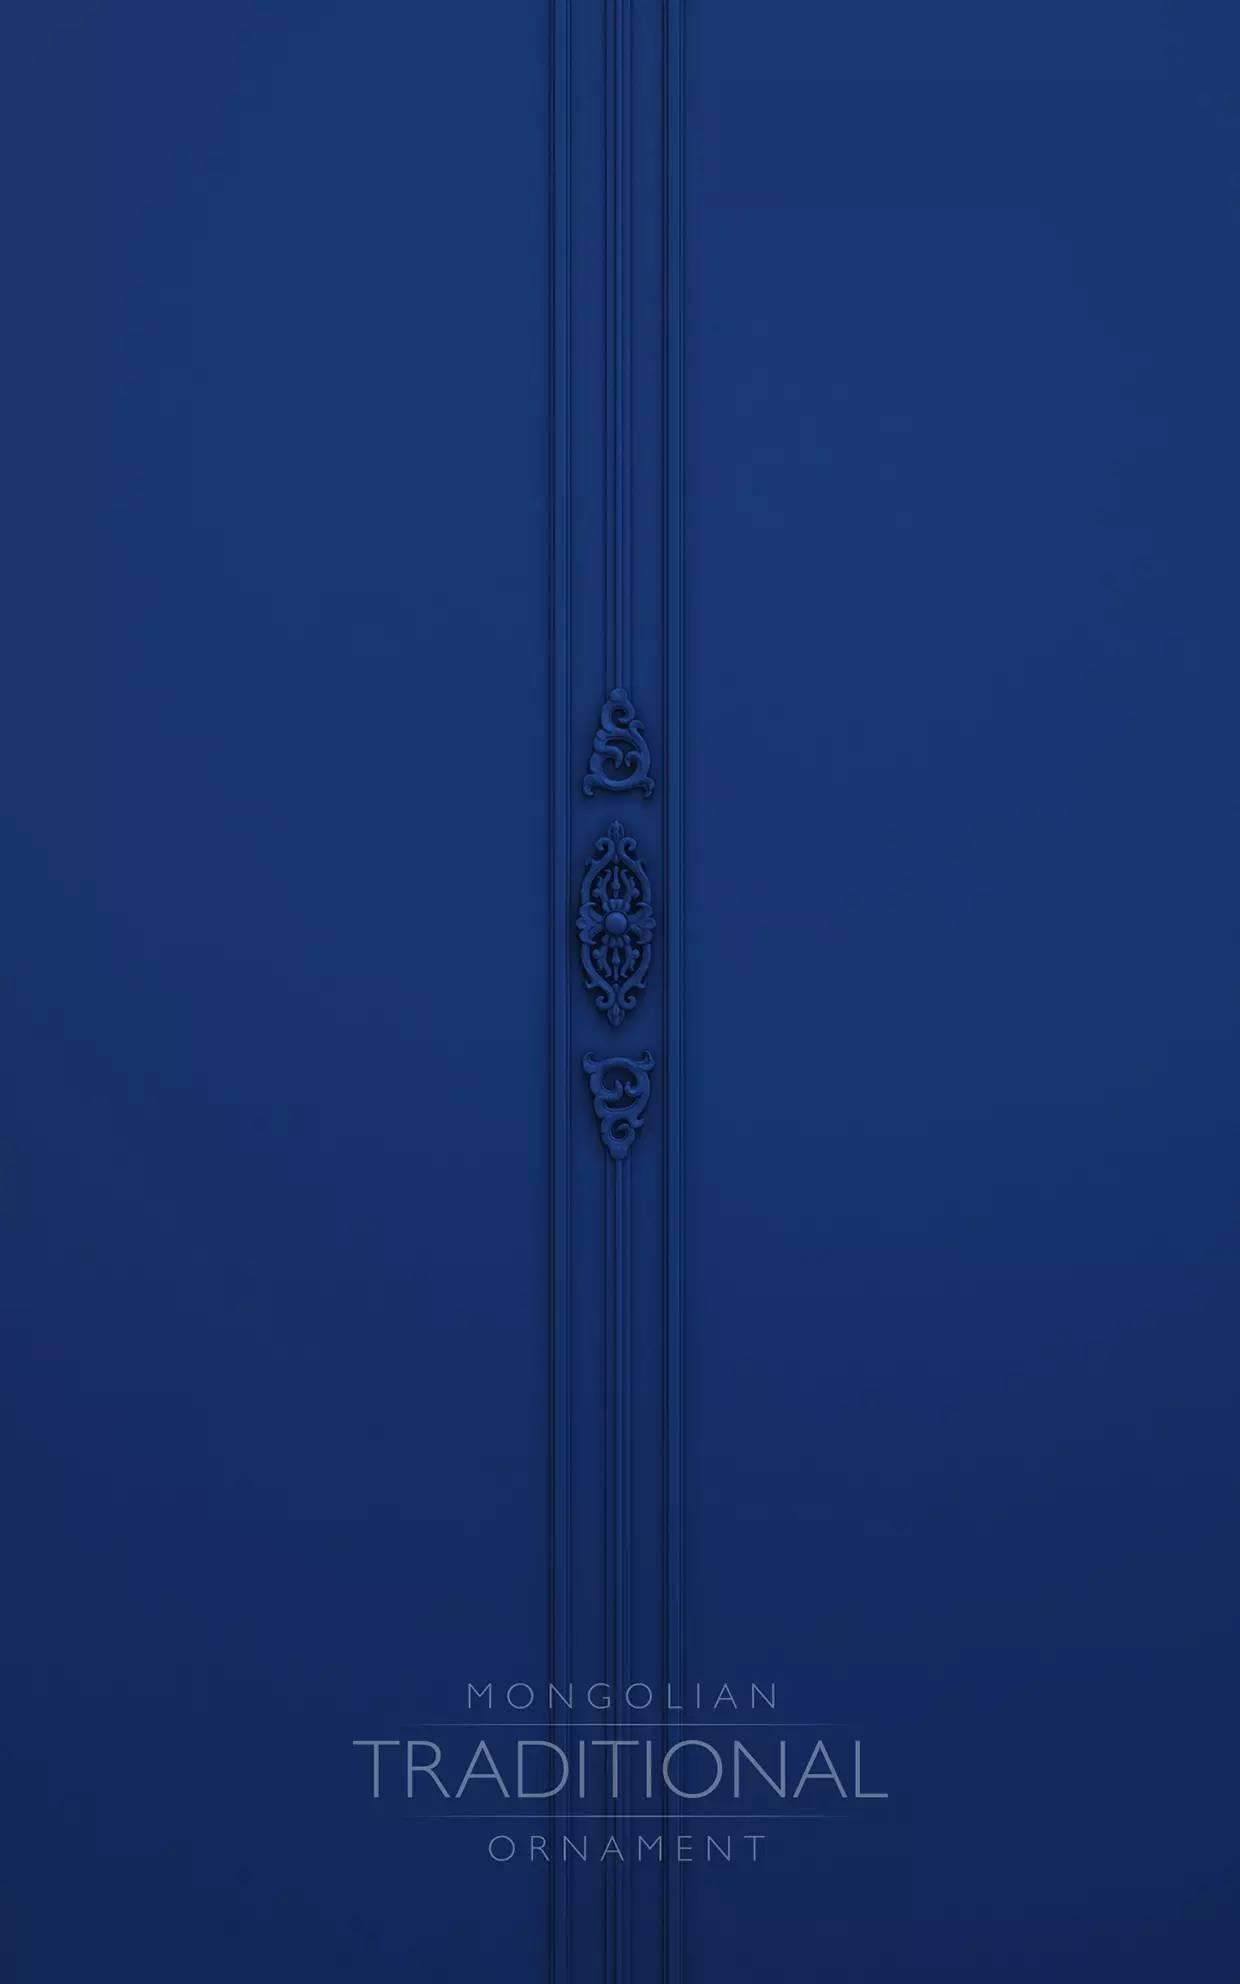 室内设计|蒙族传统装饰(Mongolian Traditional Ornament) 第9张